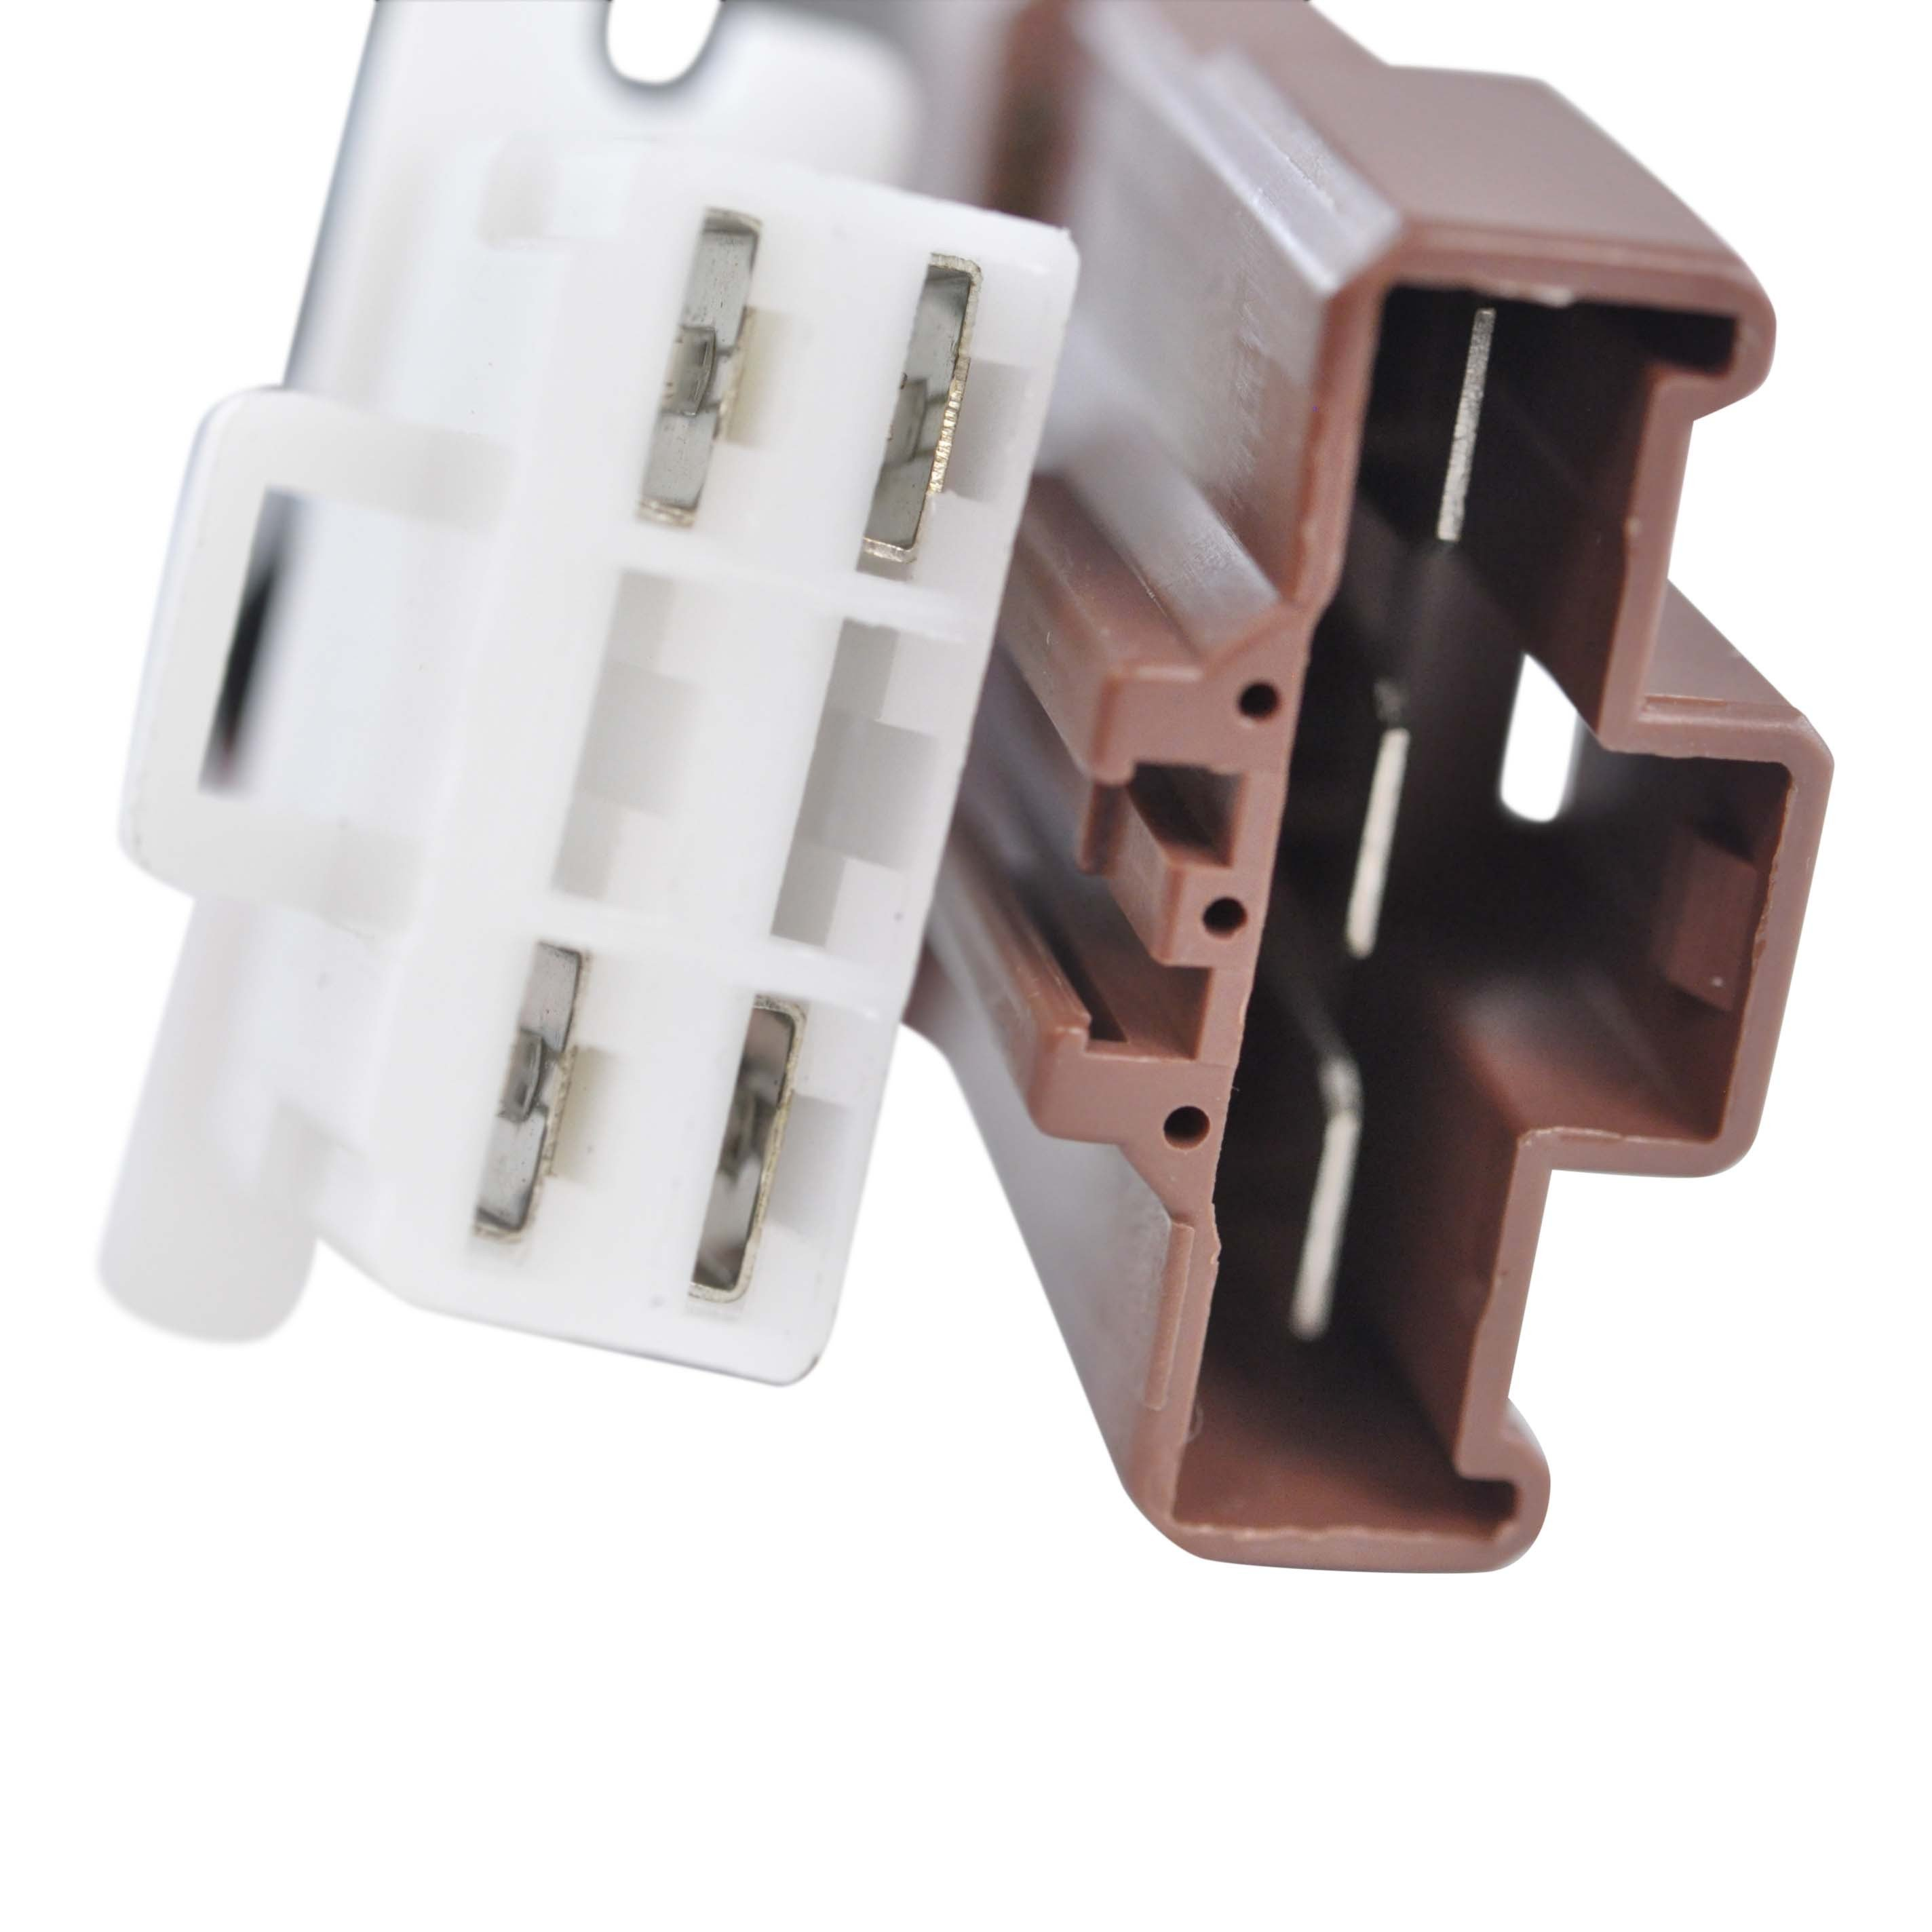 Aprillia Rsv 1000 R Regulator Rectifier Moto Electrical Aprilia Wiring Diagram Replaces Ap8124267